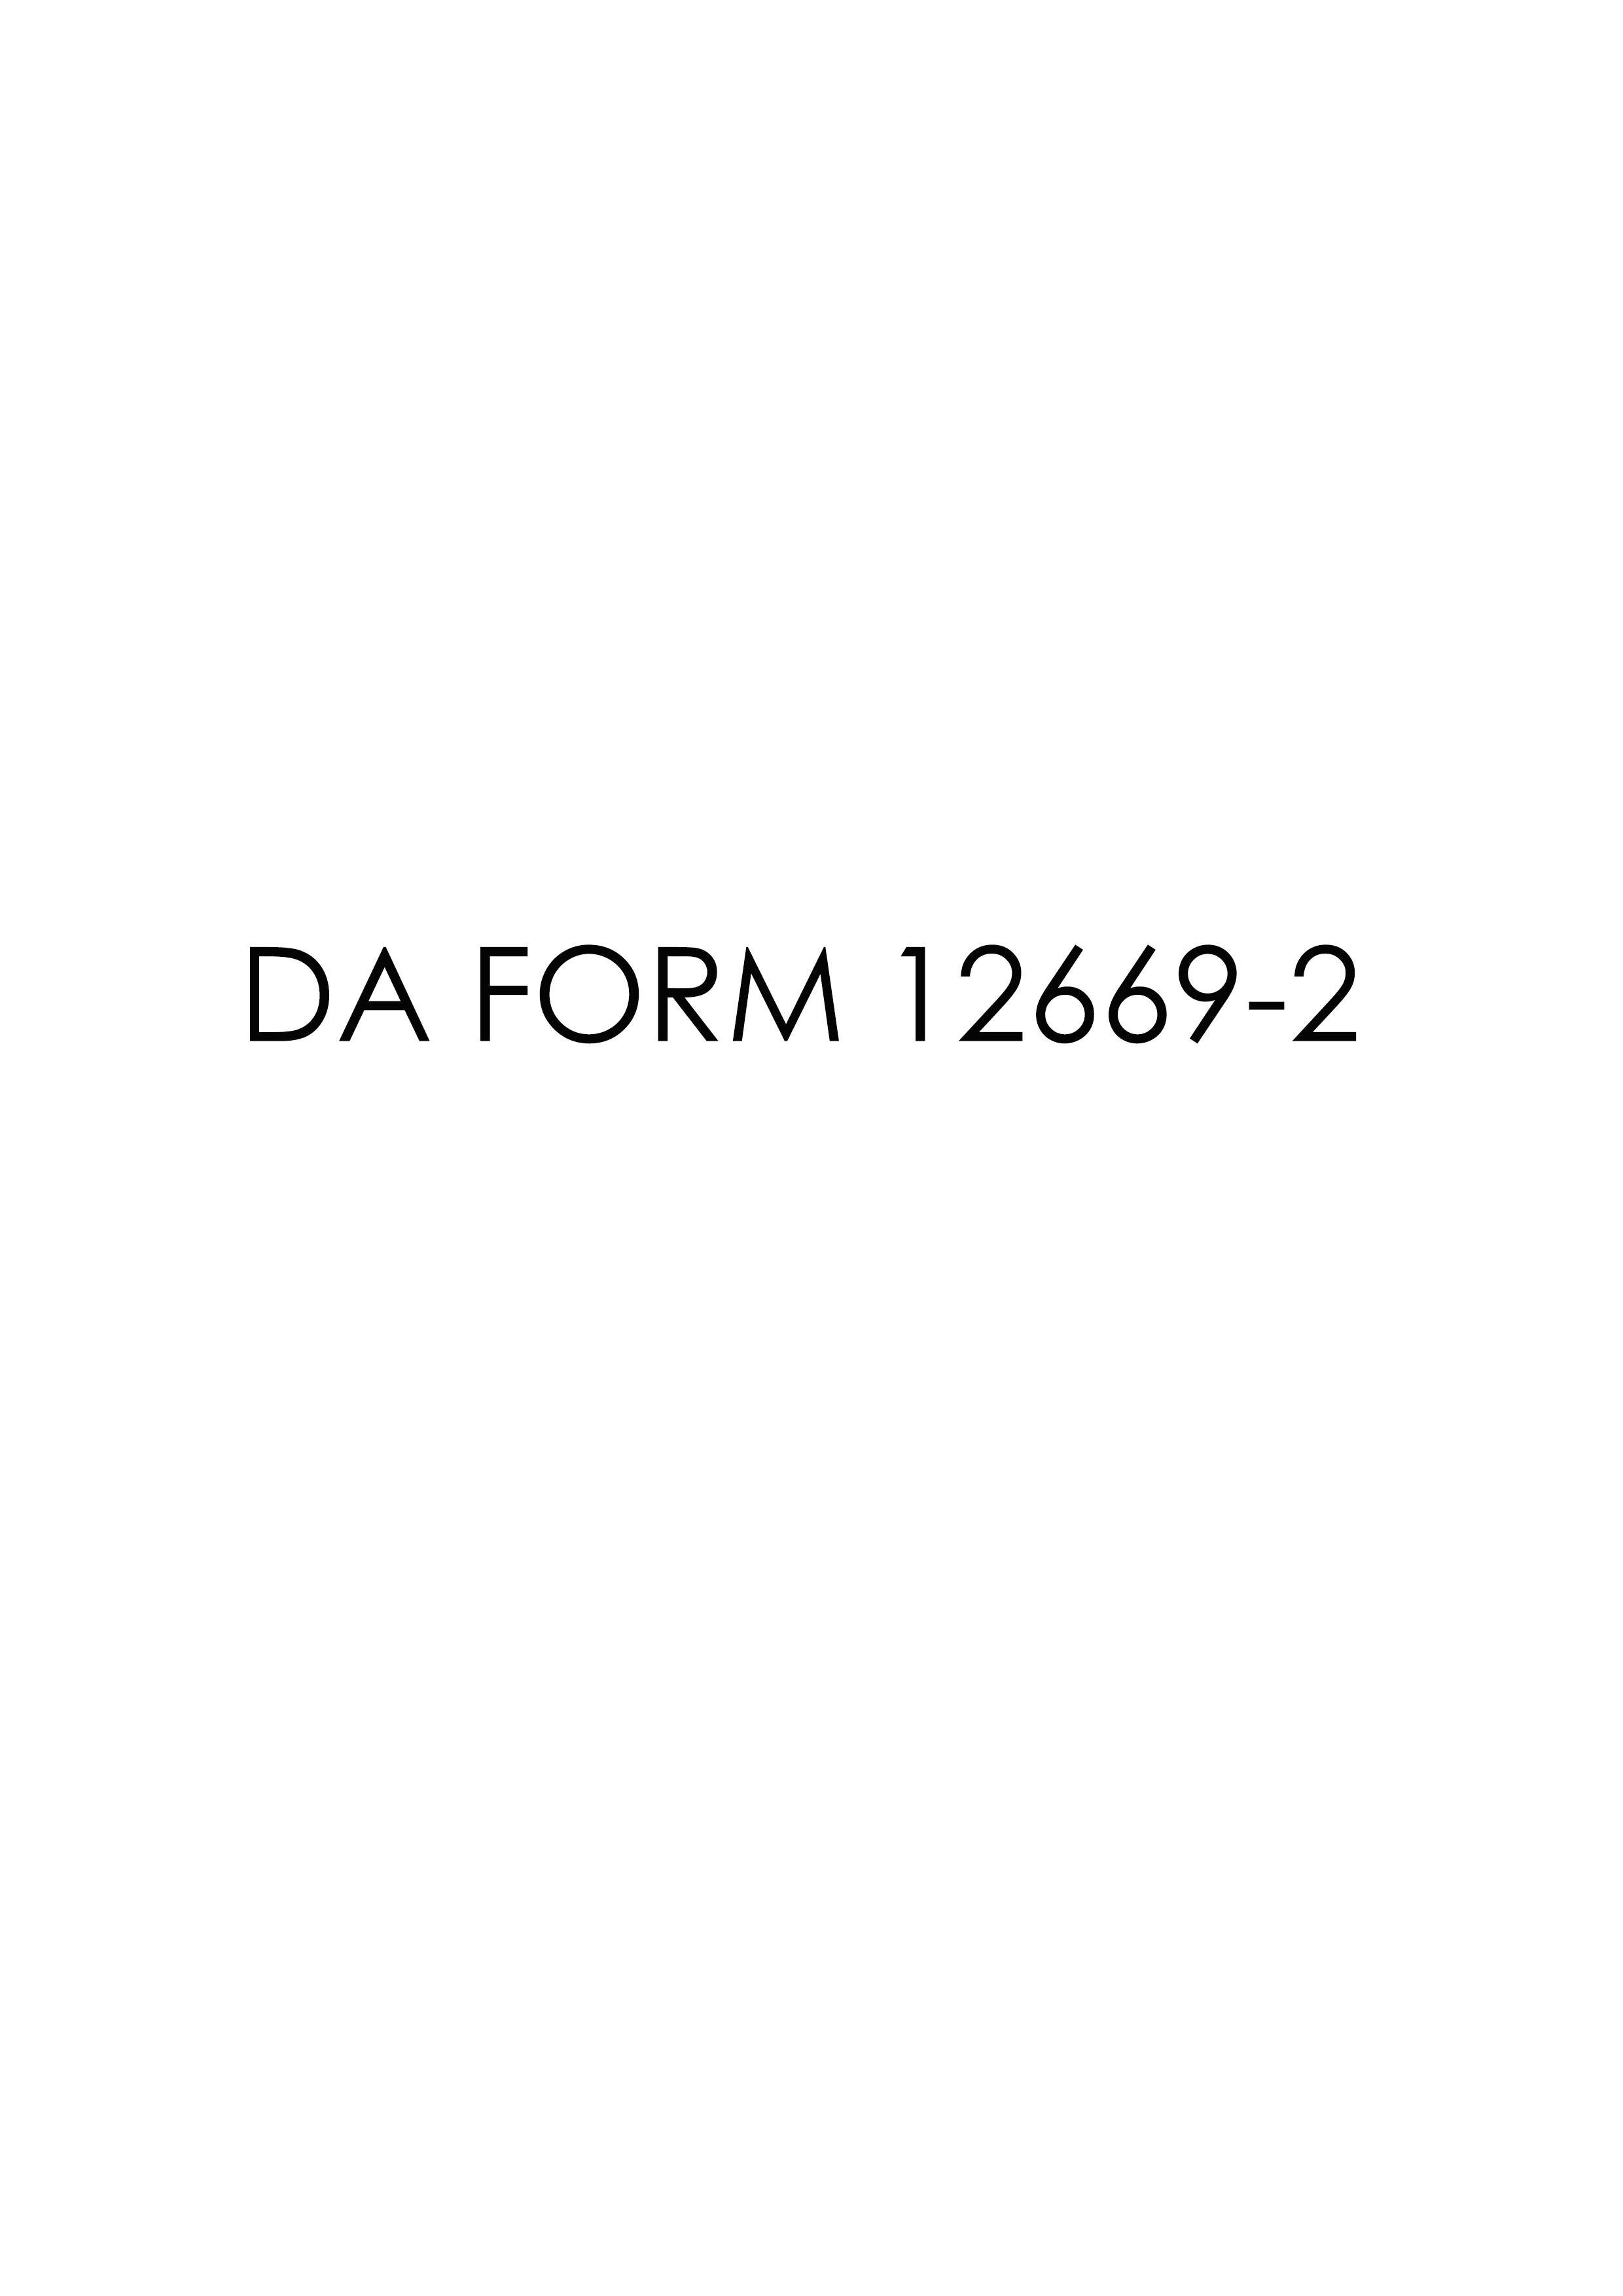 Download da Form 12669-2 Free